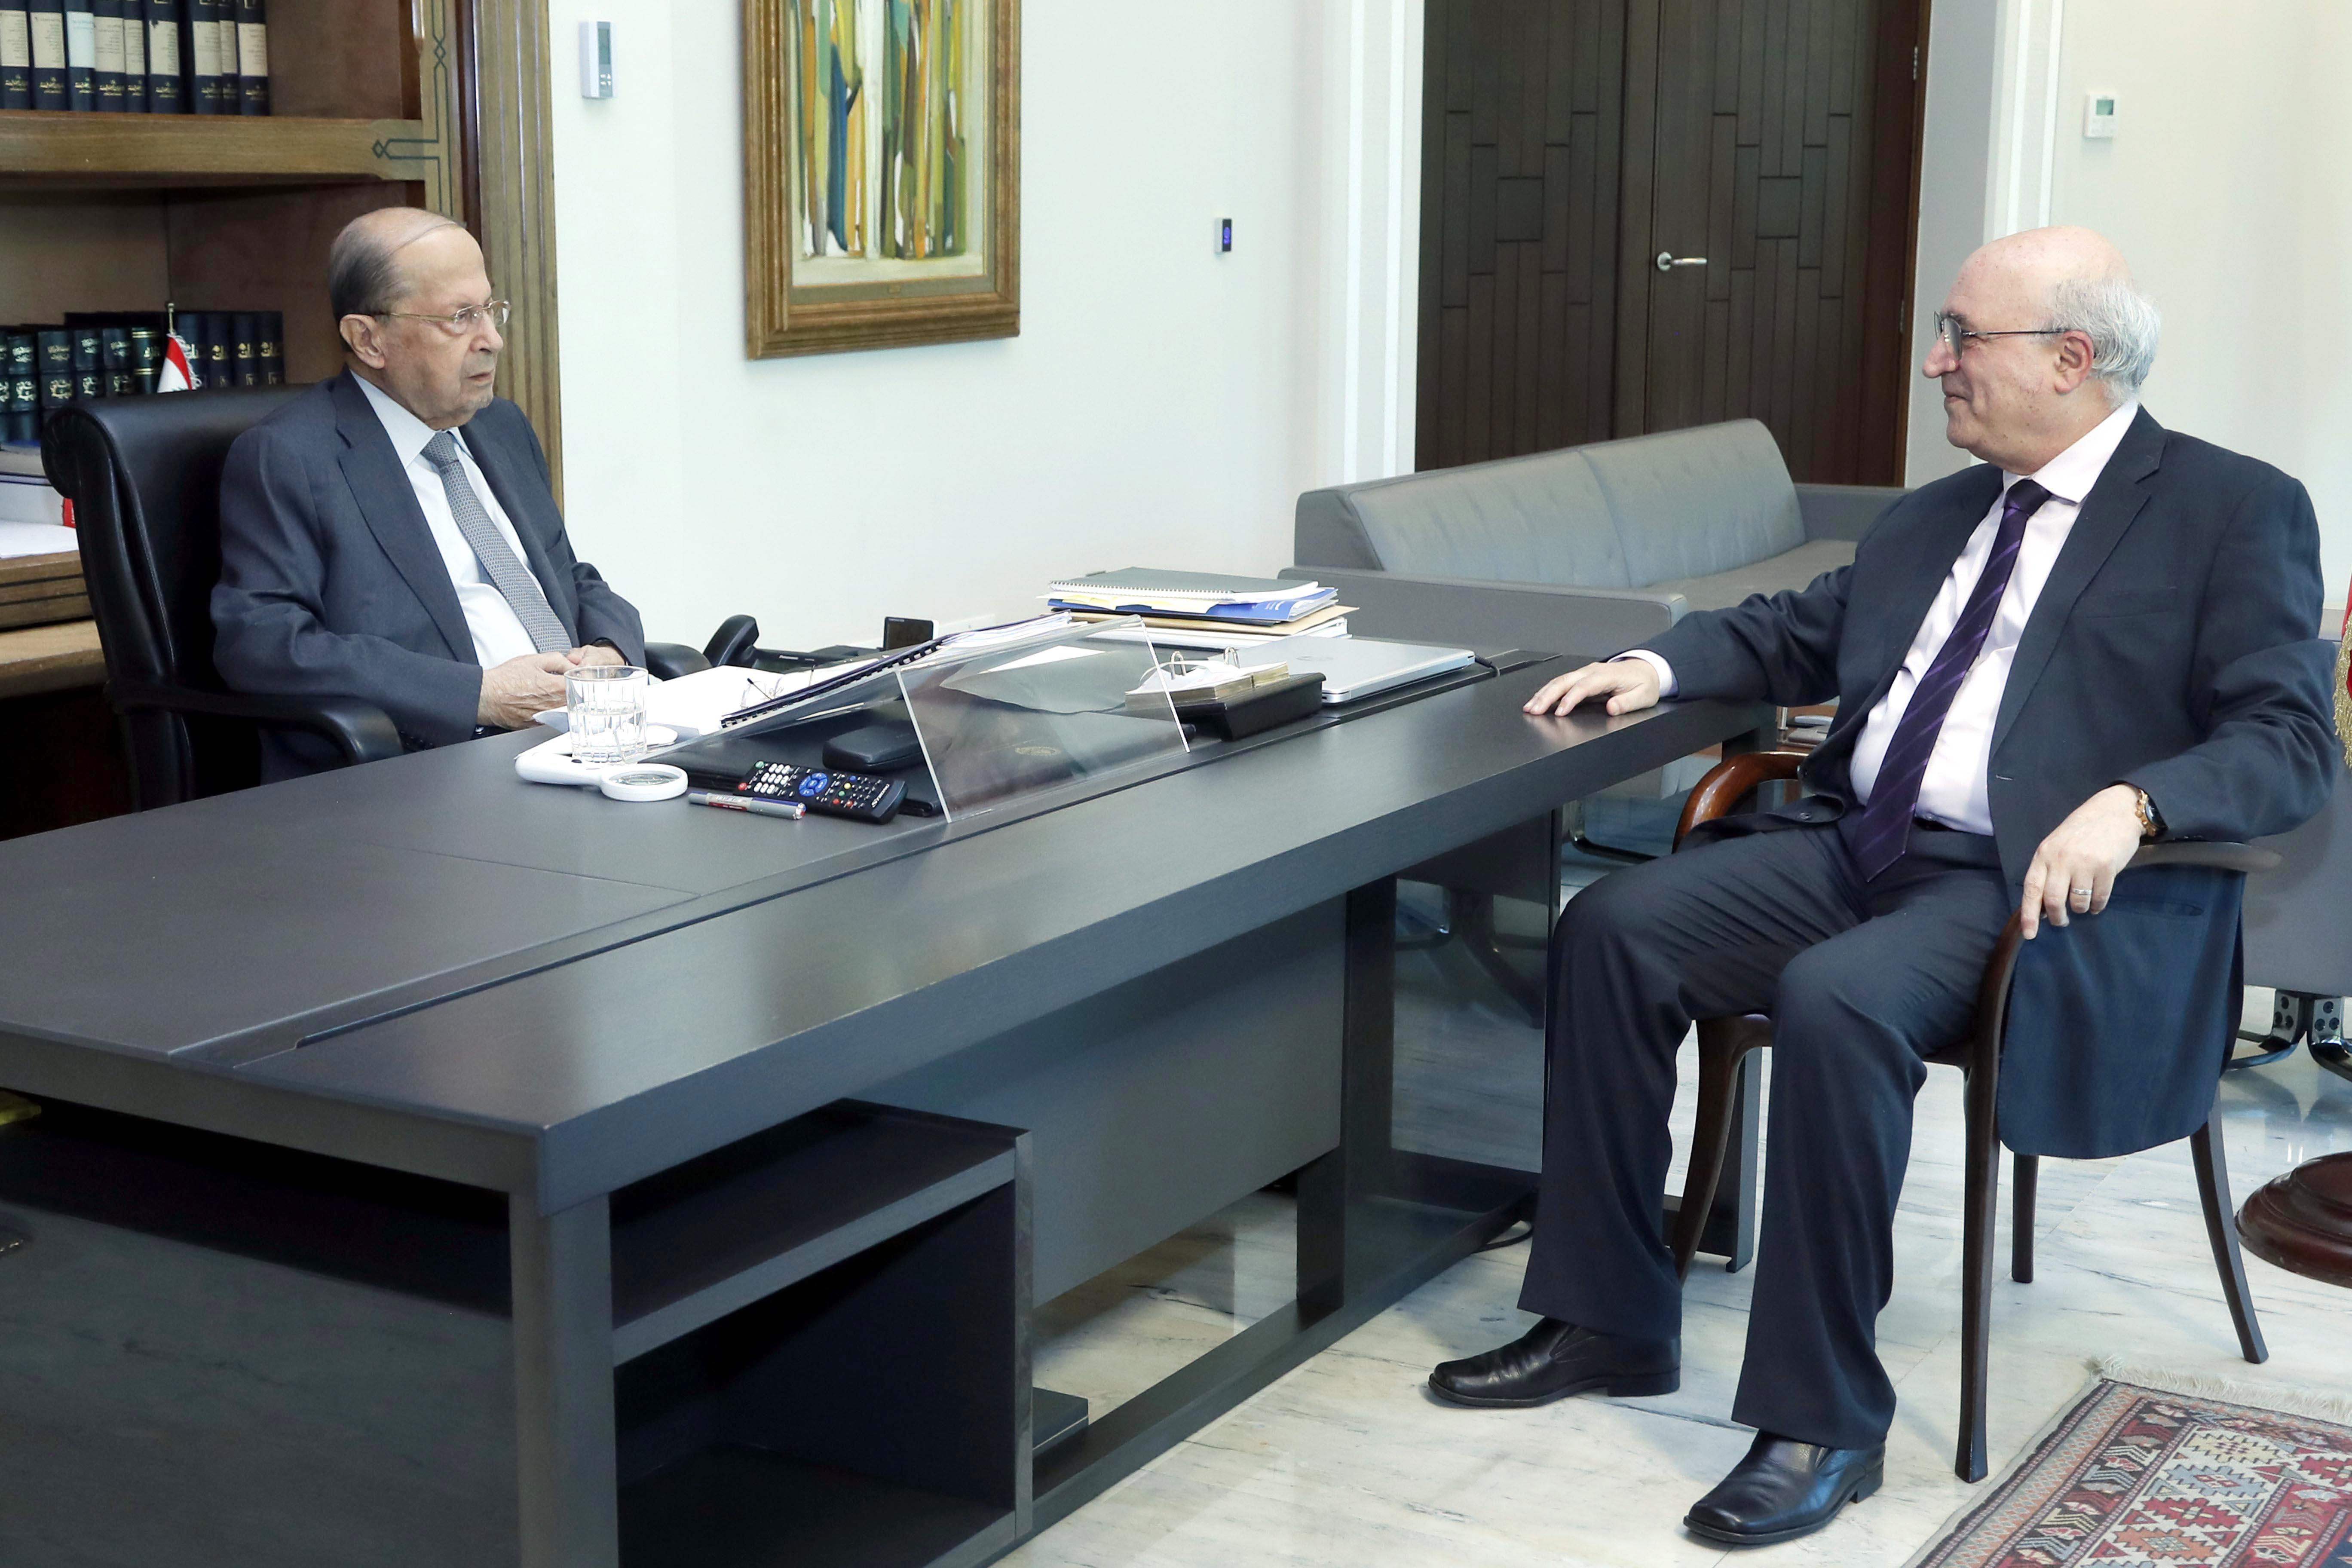 2 - Former MP Nasser Kandil